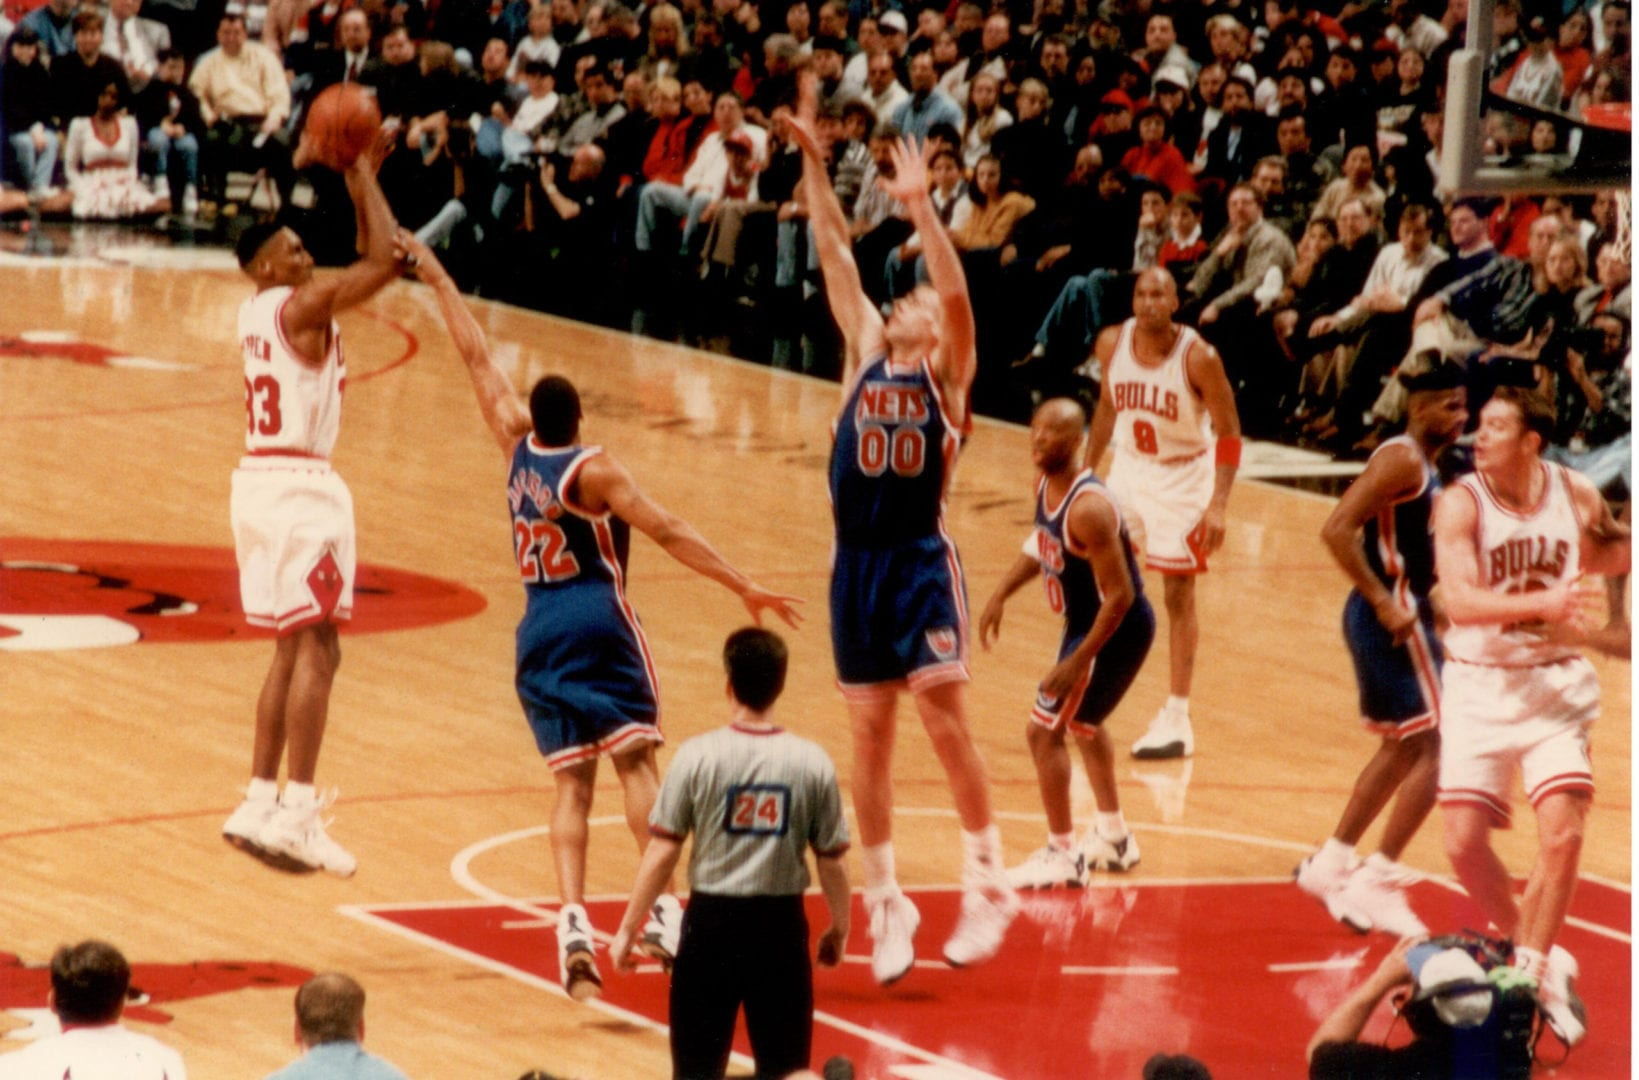 Scottie Pippen taking his jump shot